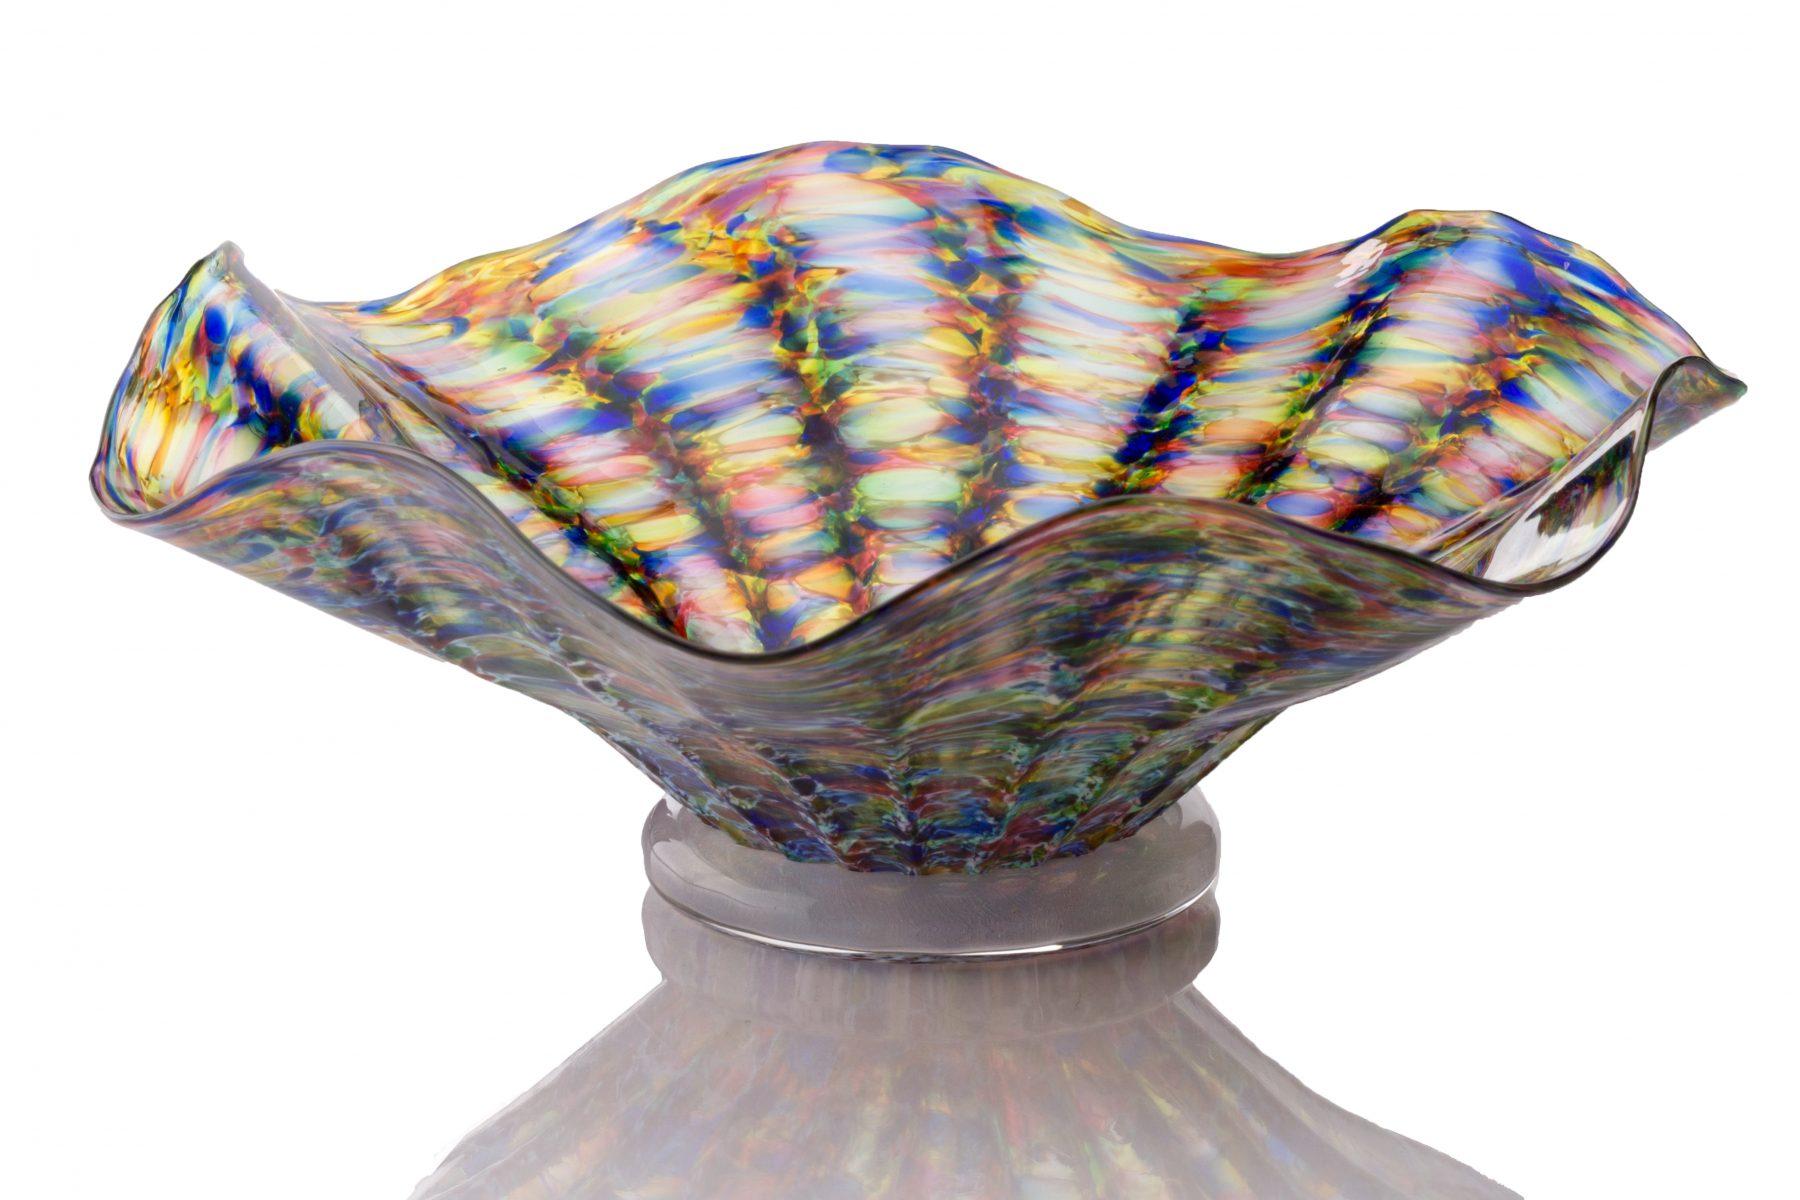 Flutter bowl solo